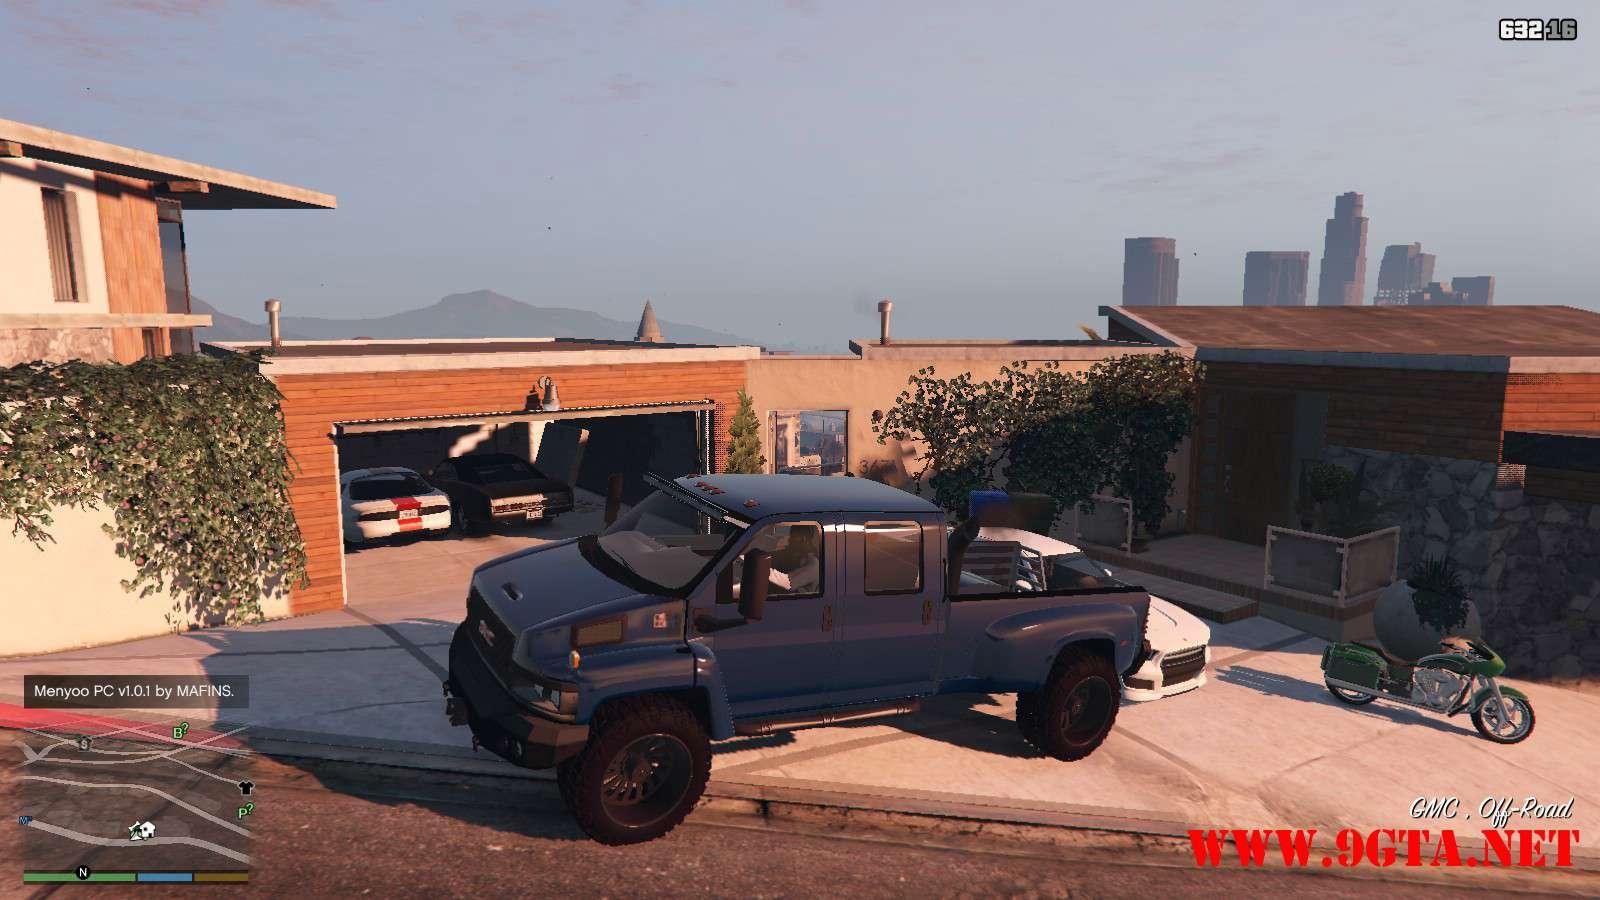 2009 GMC Topkick Truck GTA5 Mods (1)